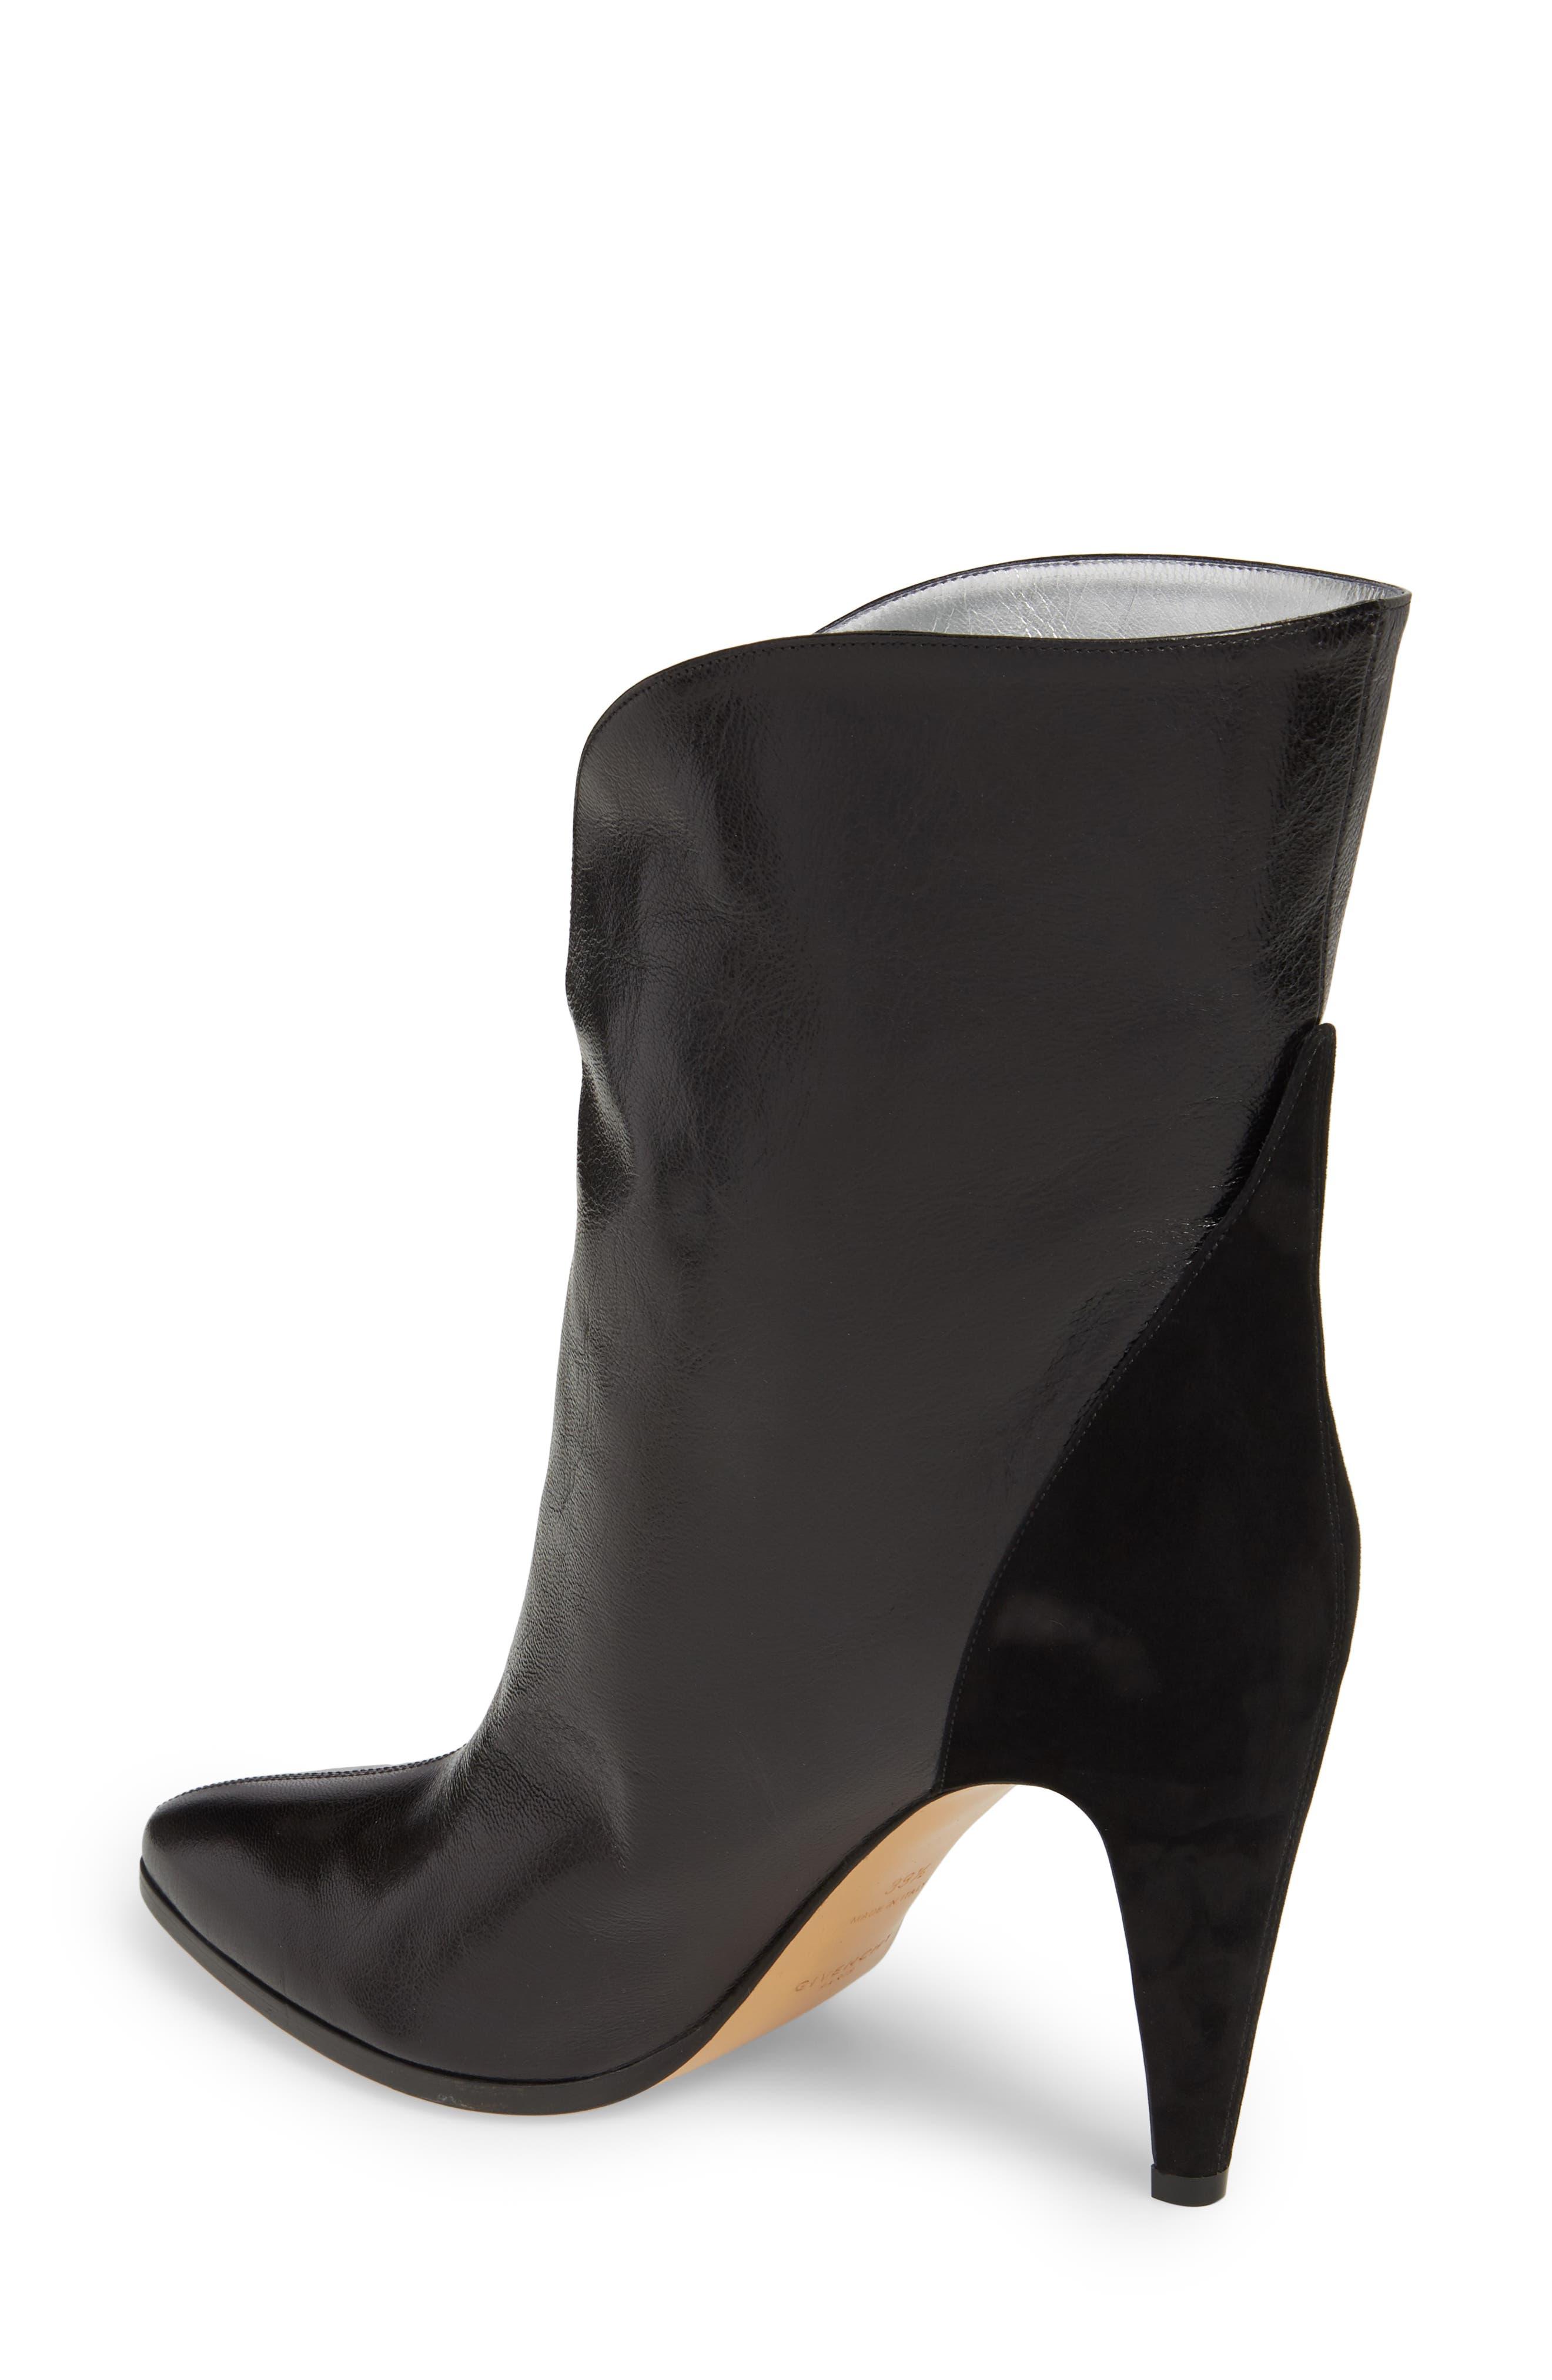 GV3 Mid High Boot,                             Alternate thumbnail 2, color,                             Black